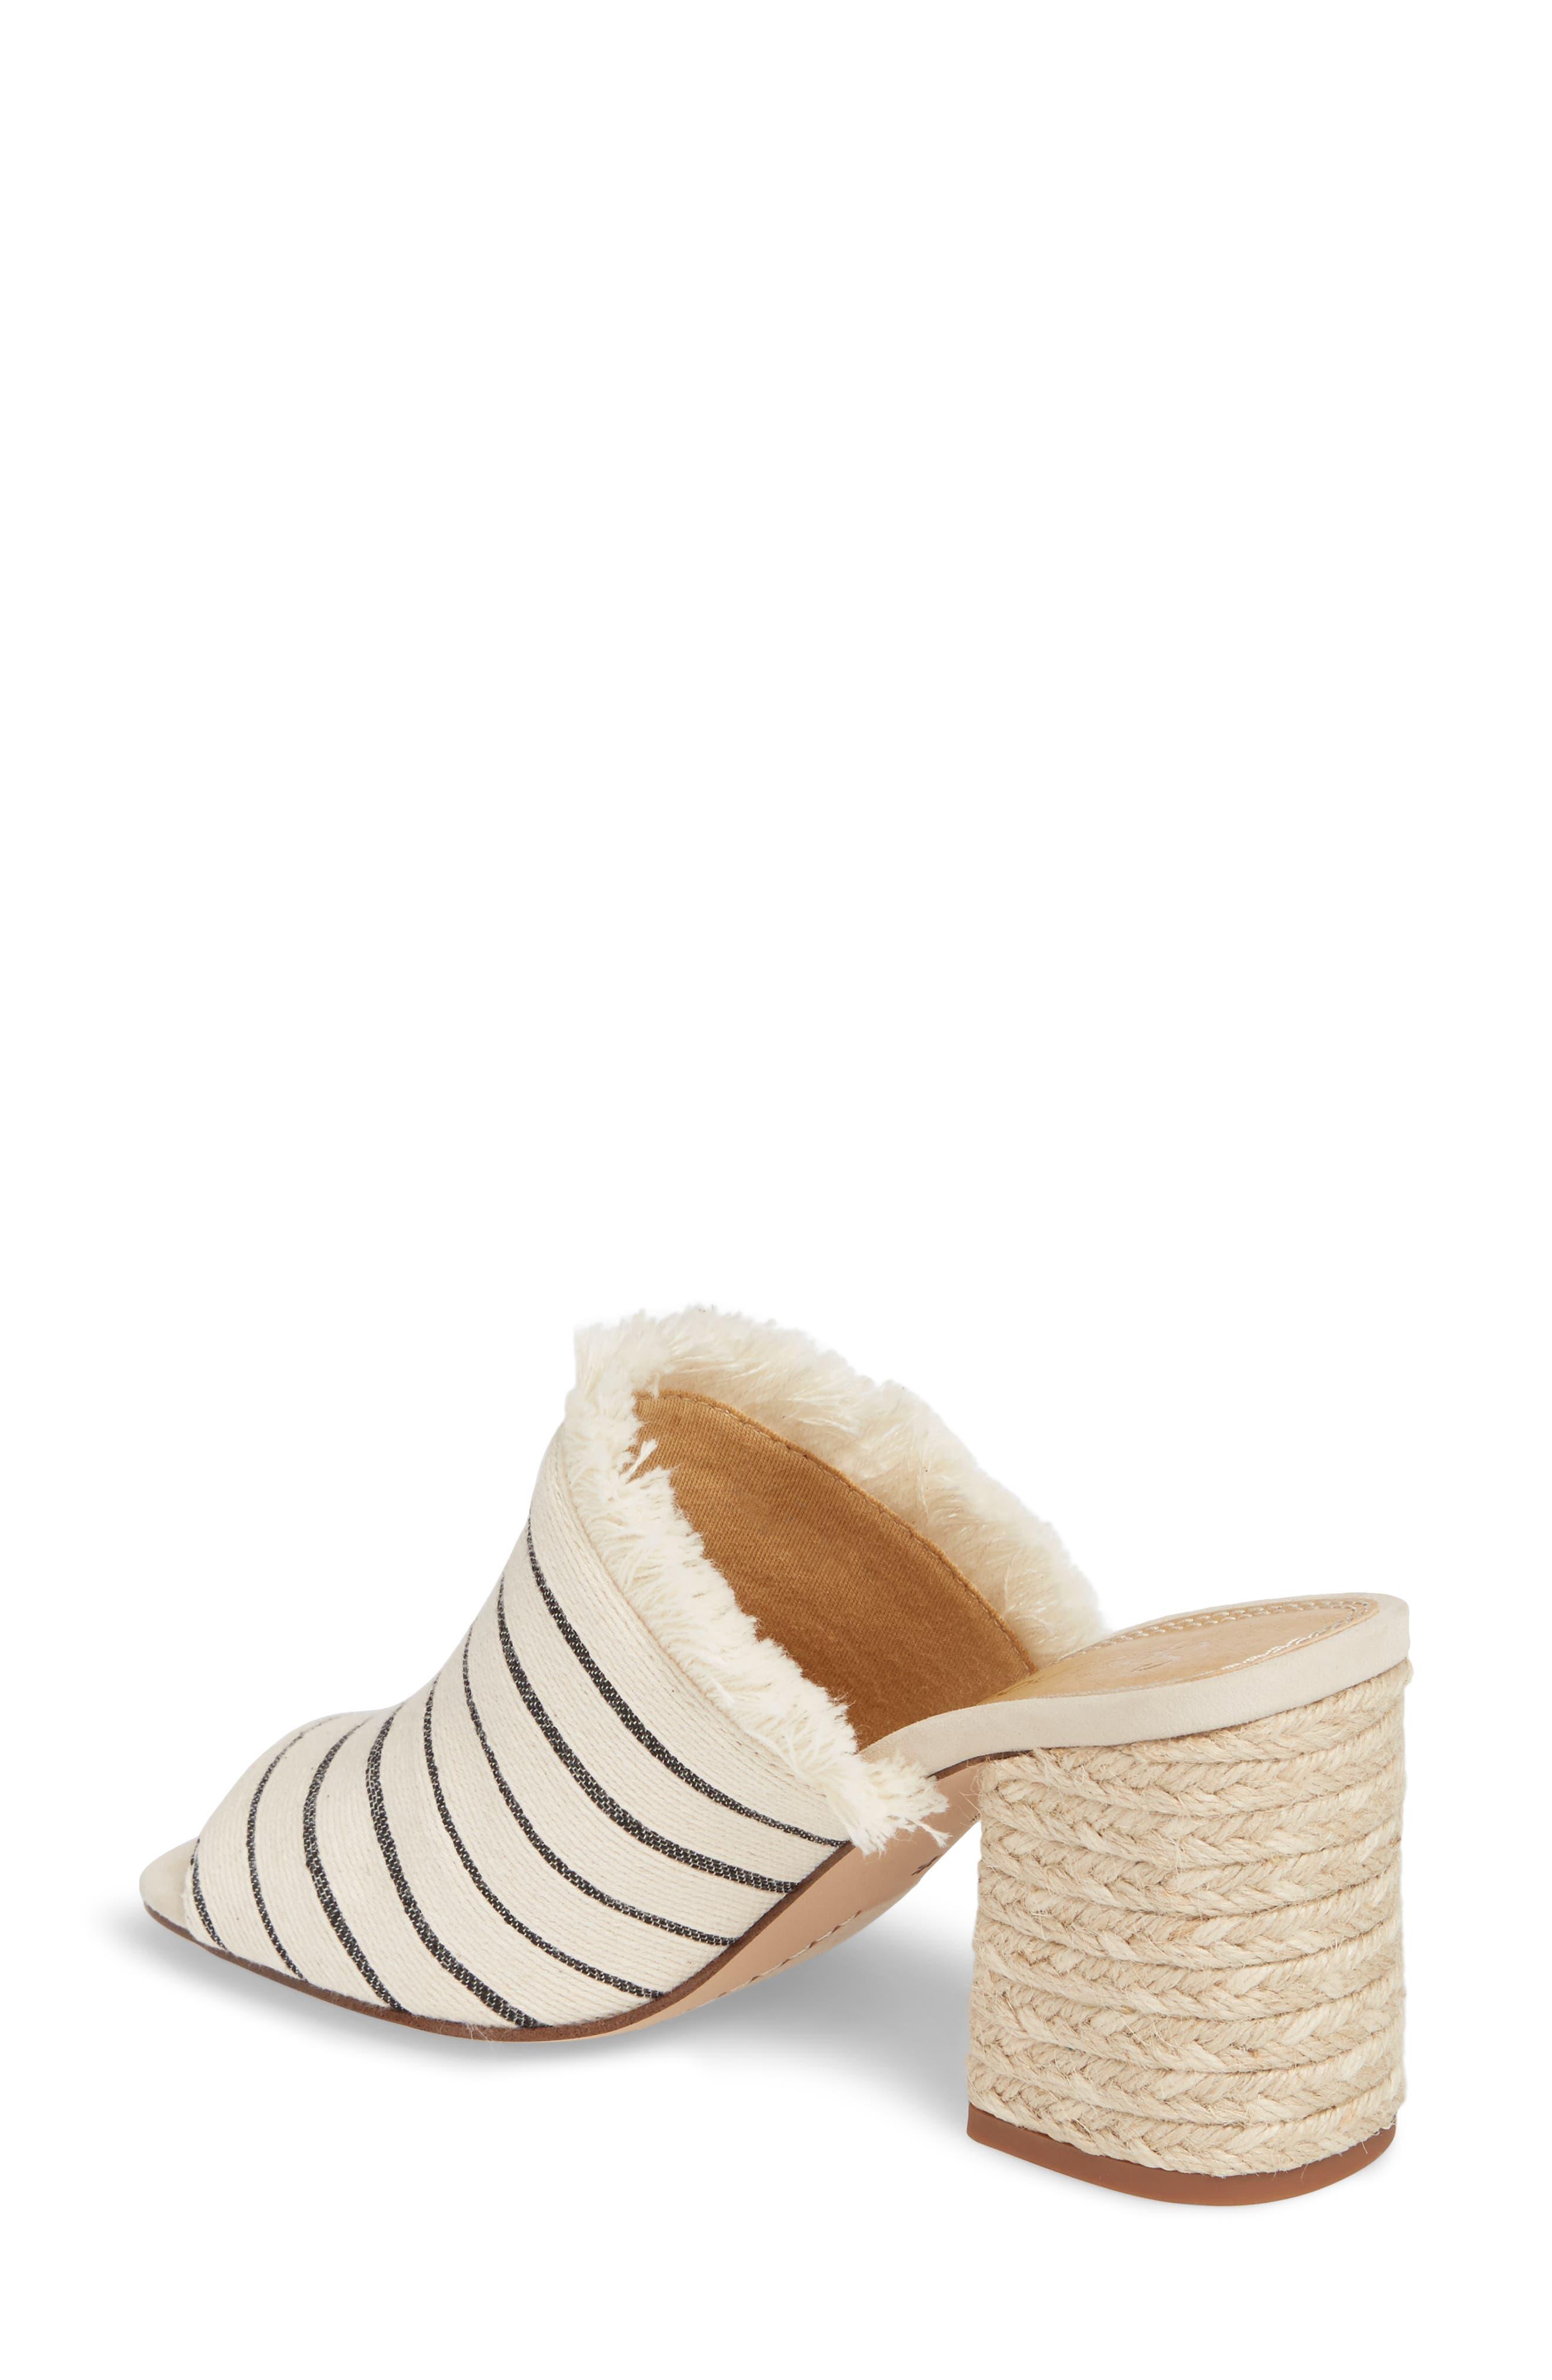 Baron Fringed Block Heel Slide,                             Alternate thumbnail 2, color,                             Cream Leather